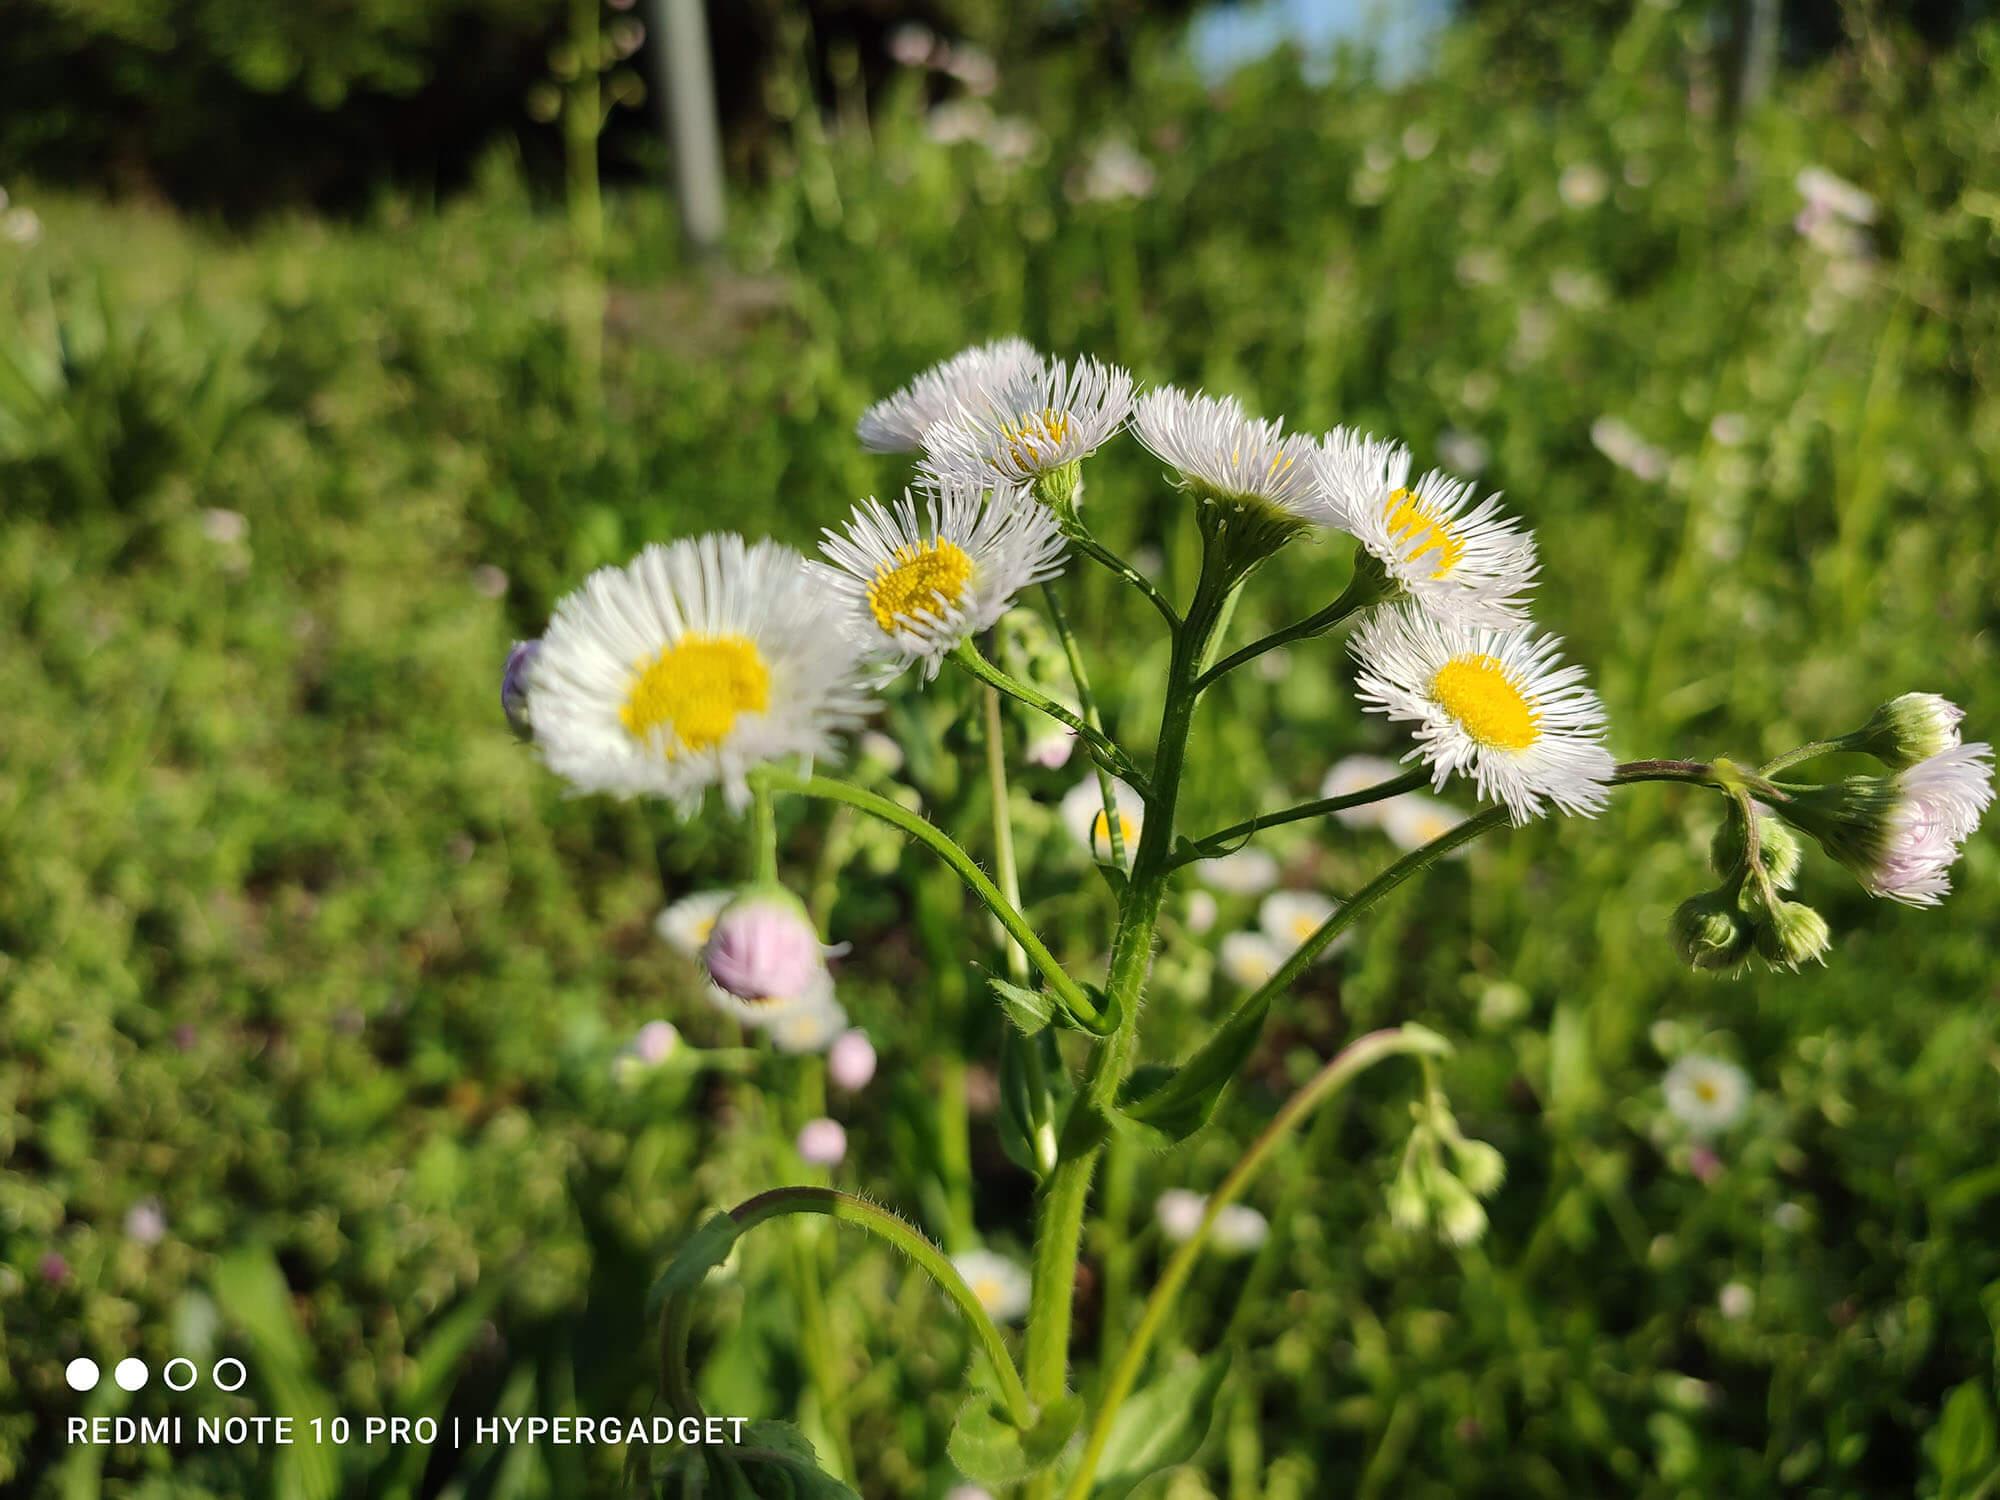 Redmi Note 10 Proで撮影した白い花の写真